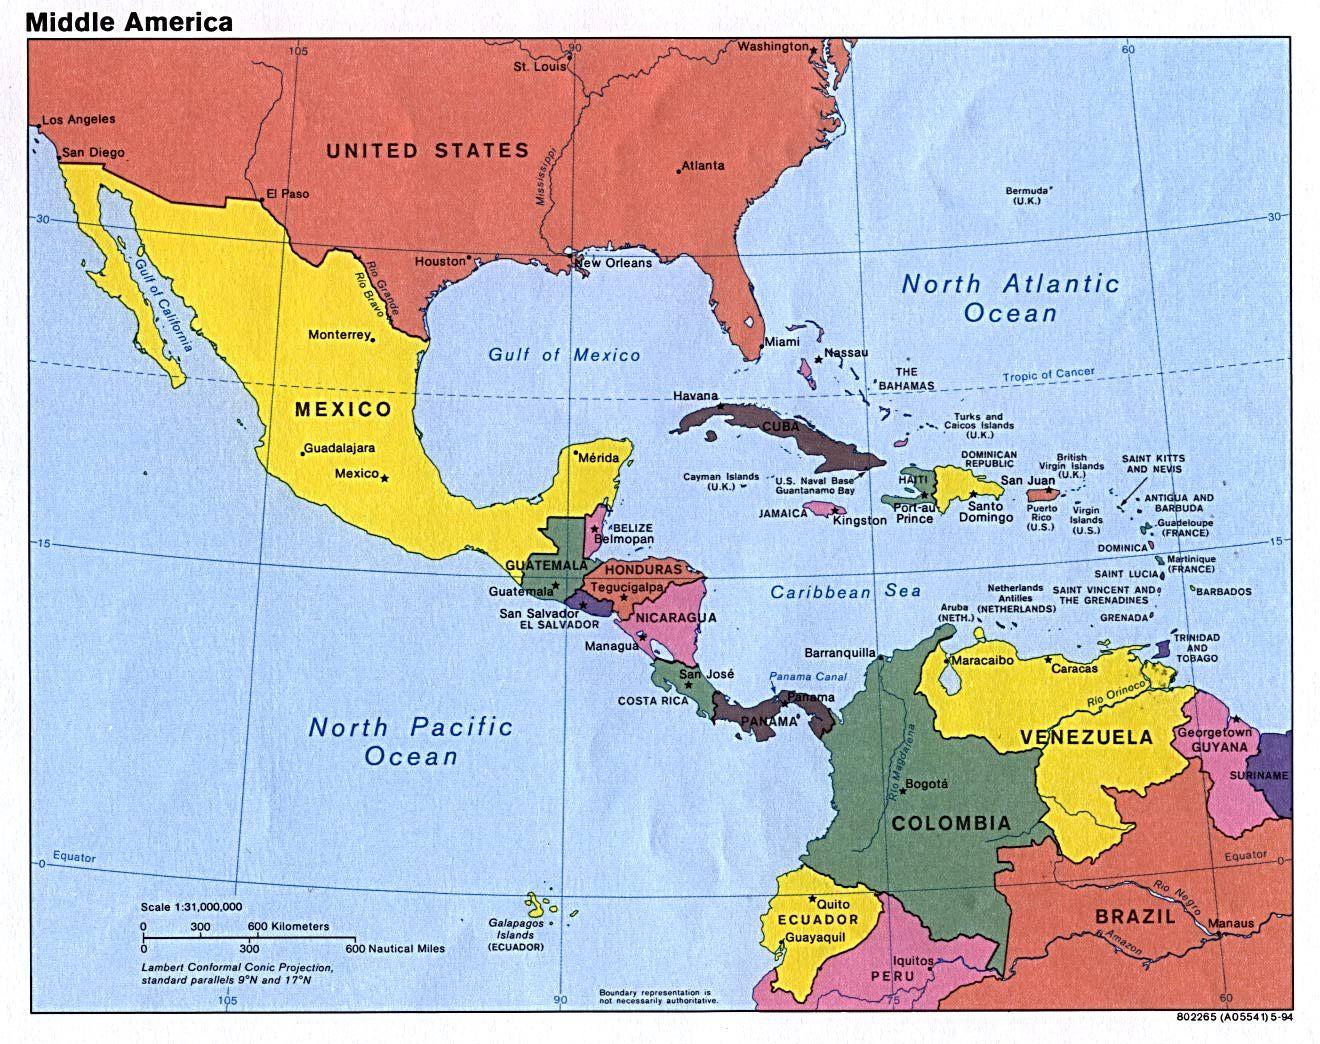 Mittelamerika Karte Staaten.Mittelamerika Länder Wissen Mittelamerika Amerika Und Landkarte